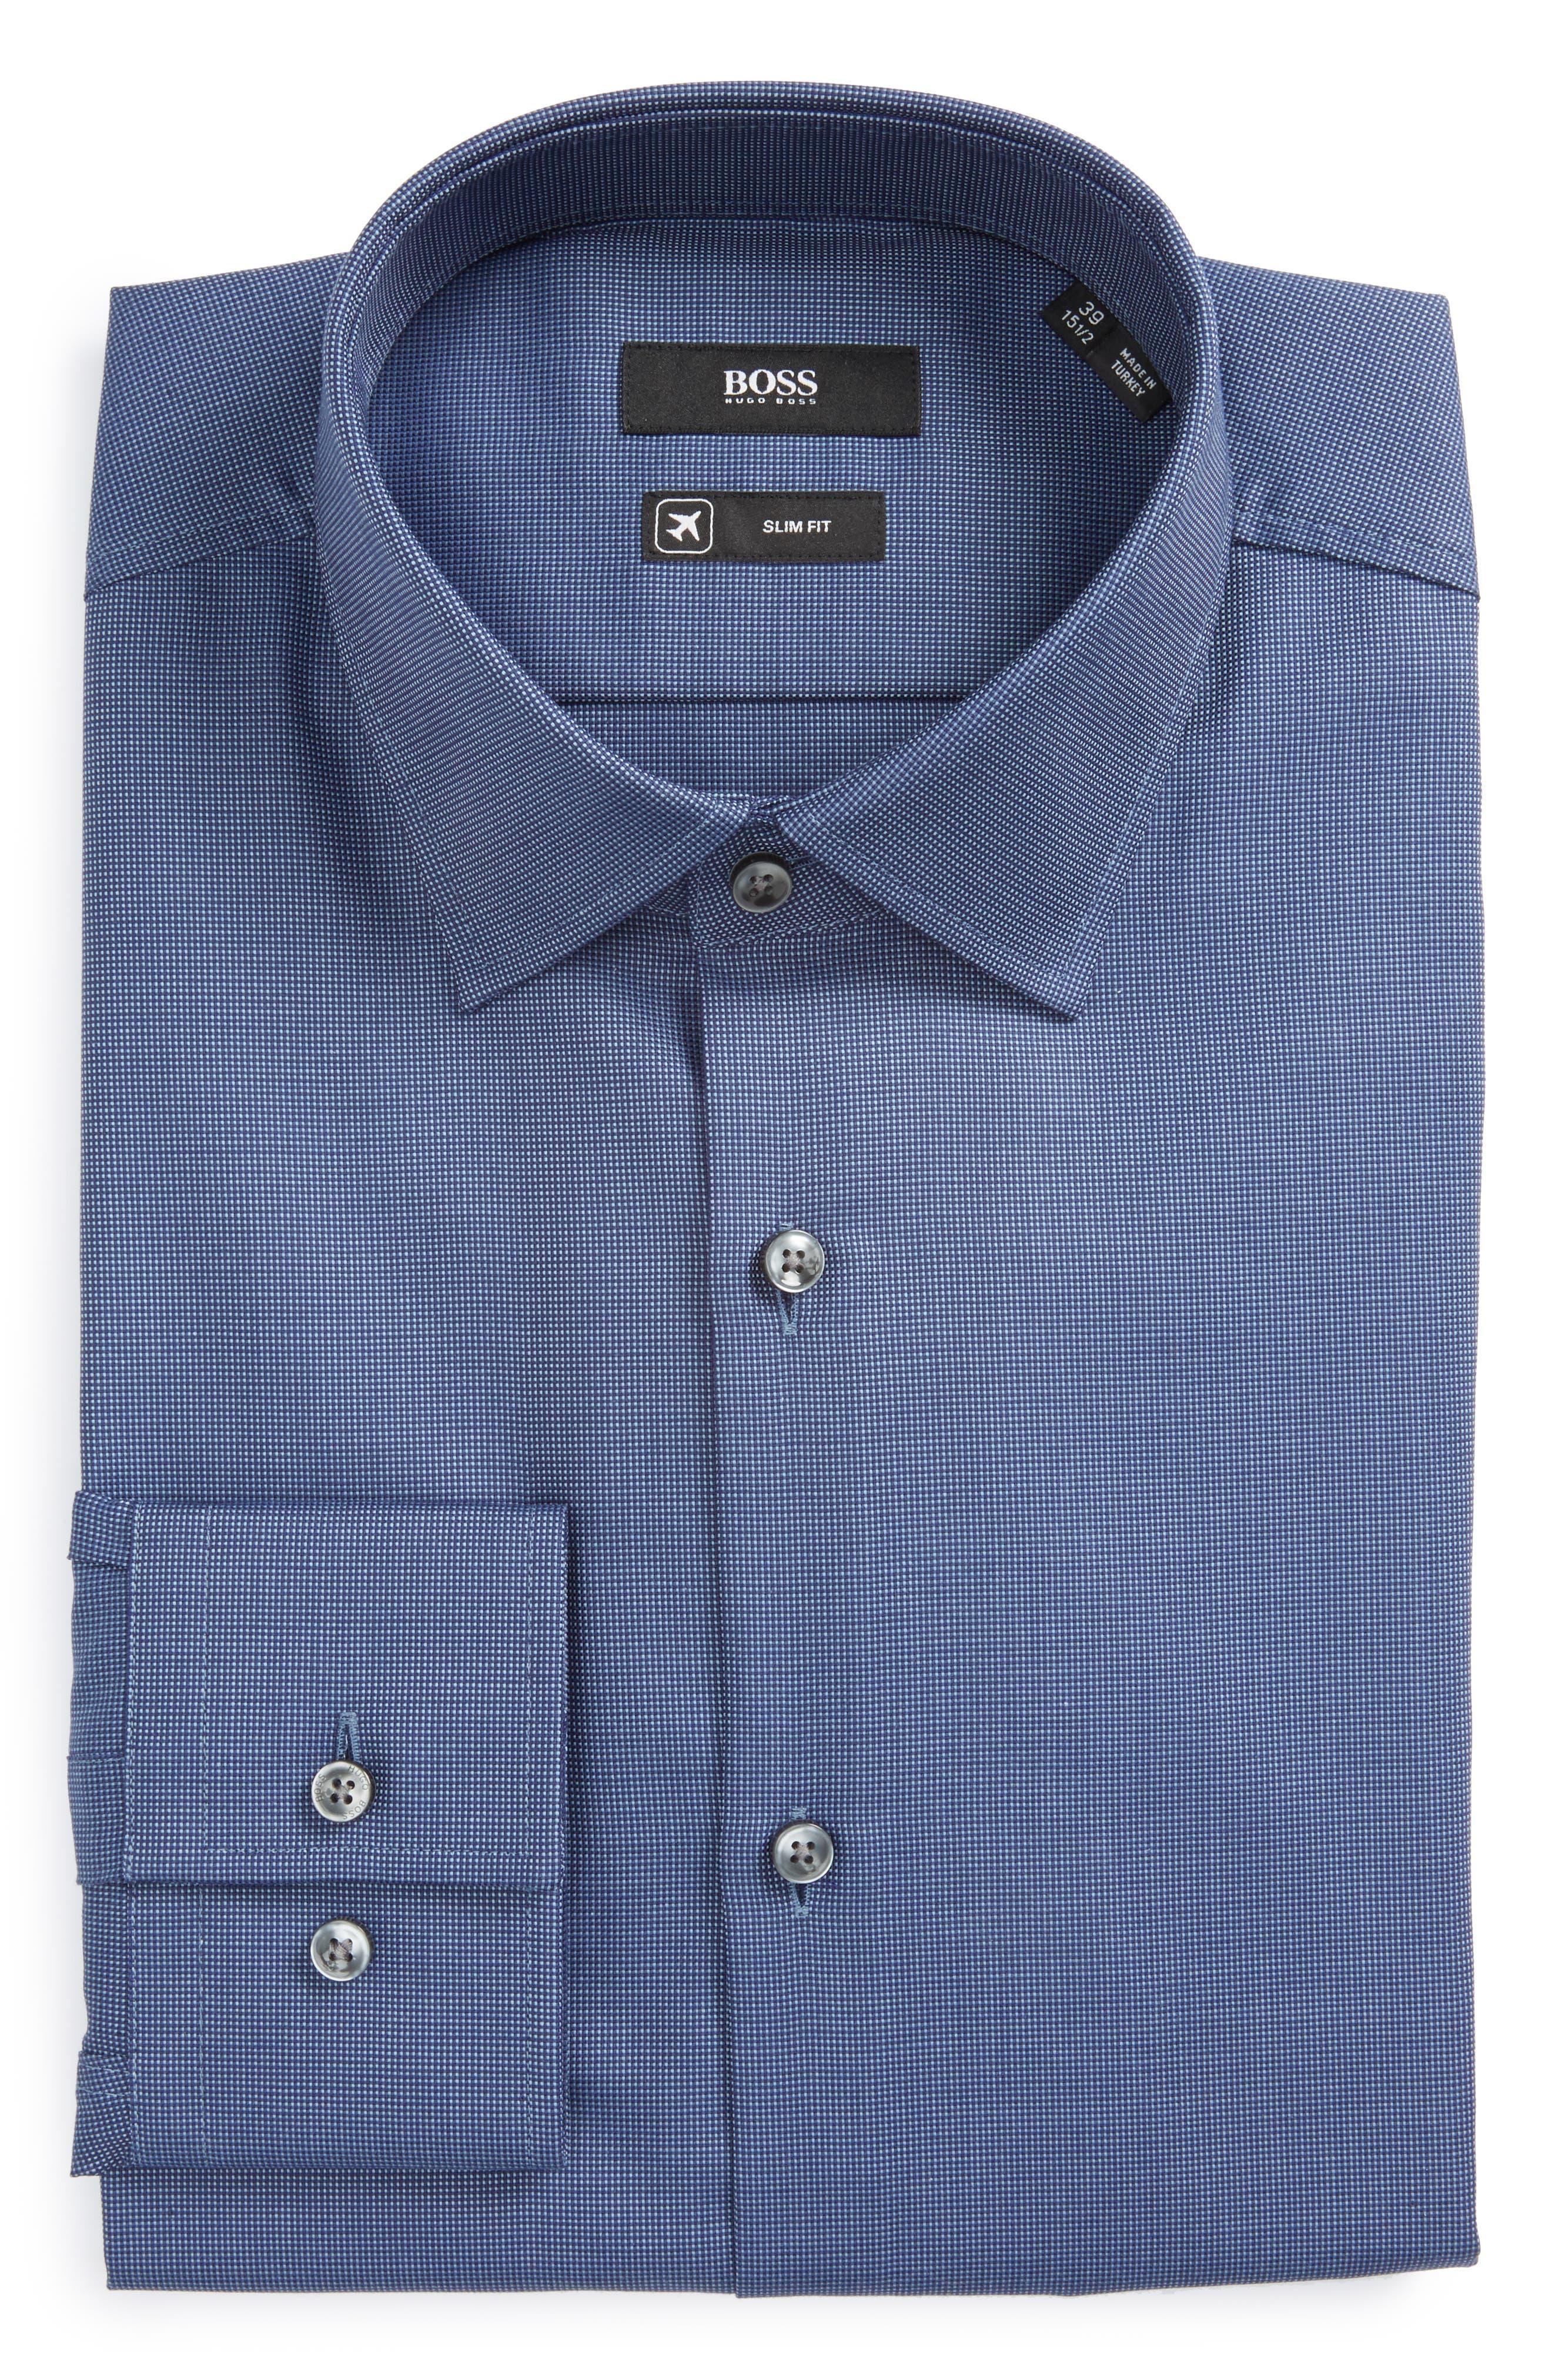 Jenno Slim Fit Solid Dress Shirt,                         Main,                         color, Medium Blue